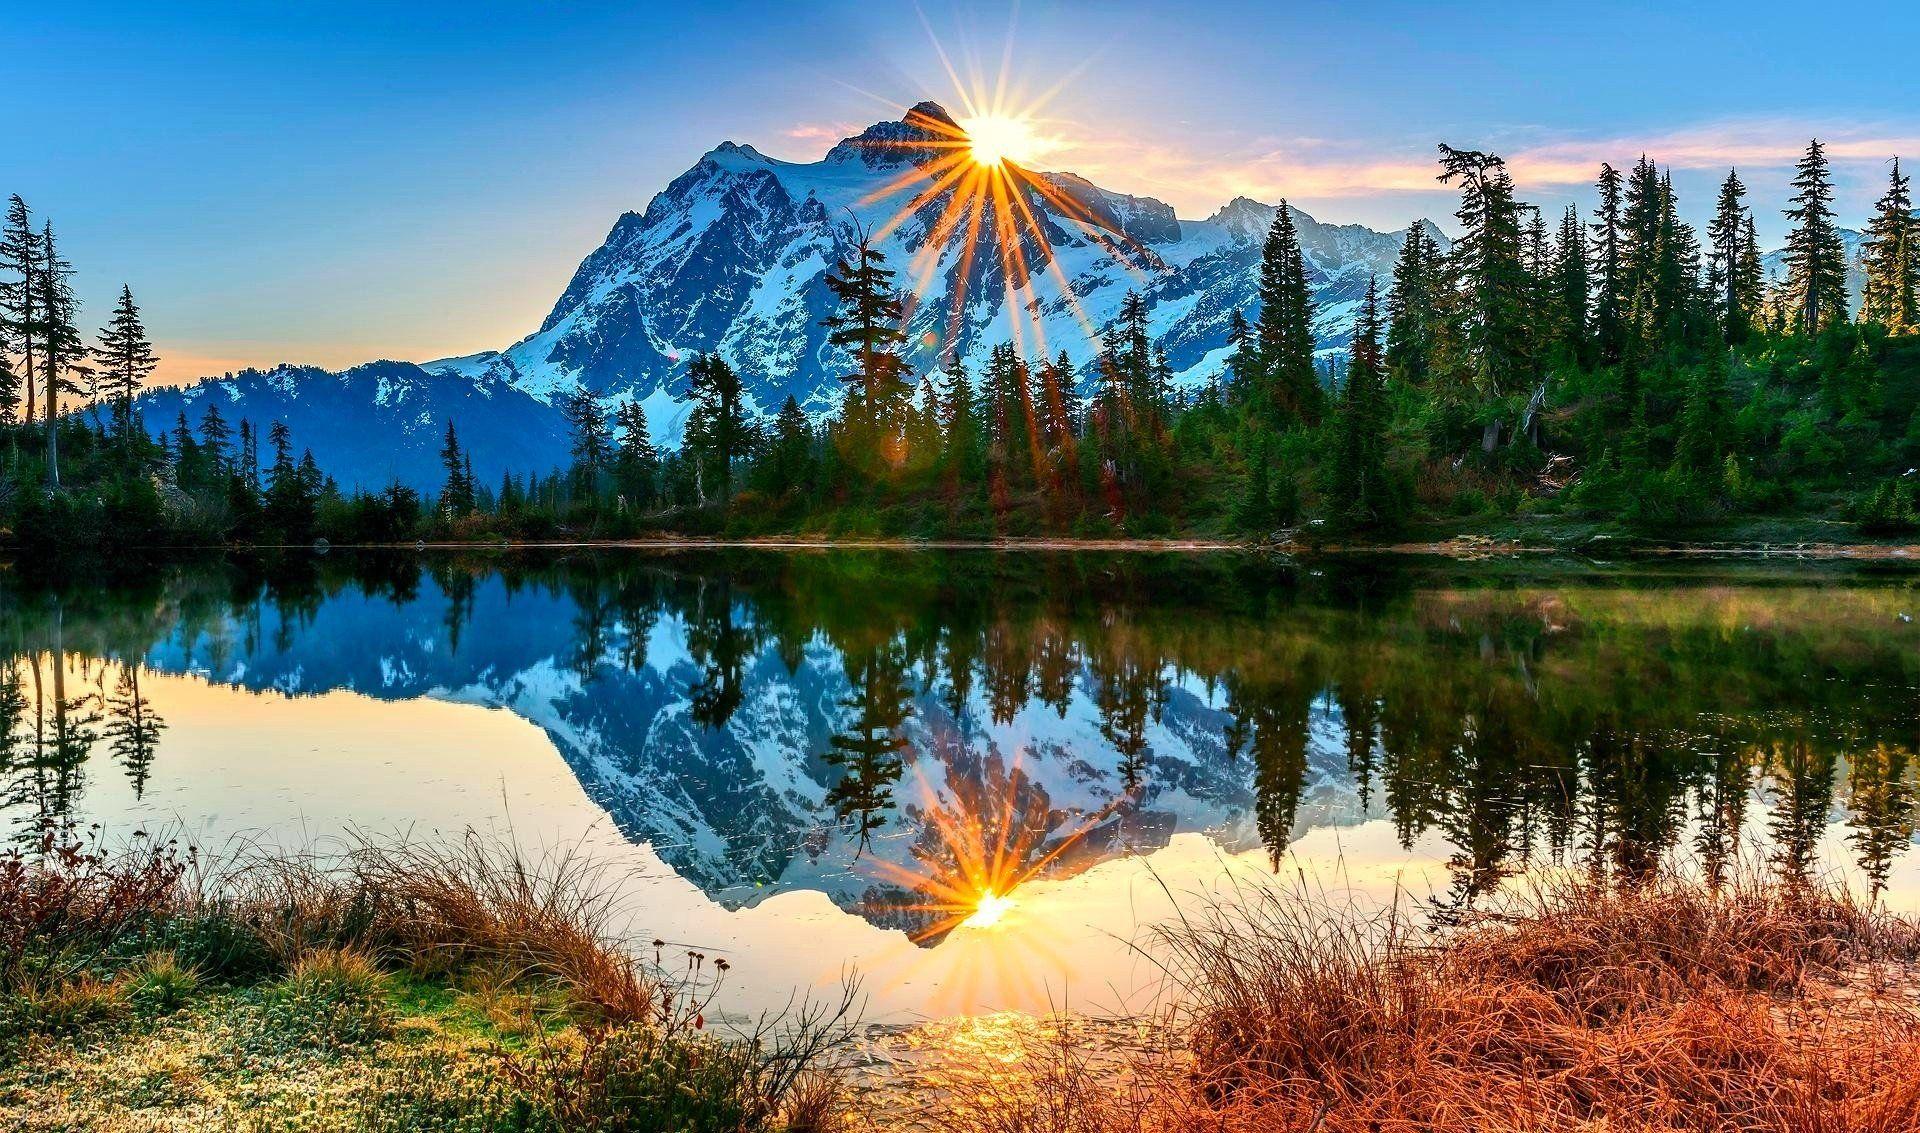 Beautiful Mountain Sunrise Wallpaper Full Hd Mountain Landscape Landscape Wallpaper Paint By Number